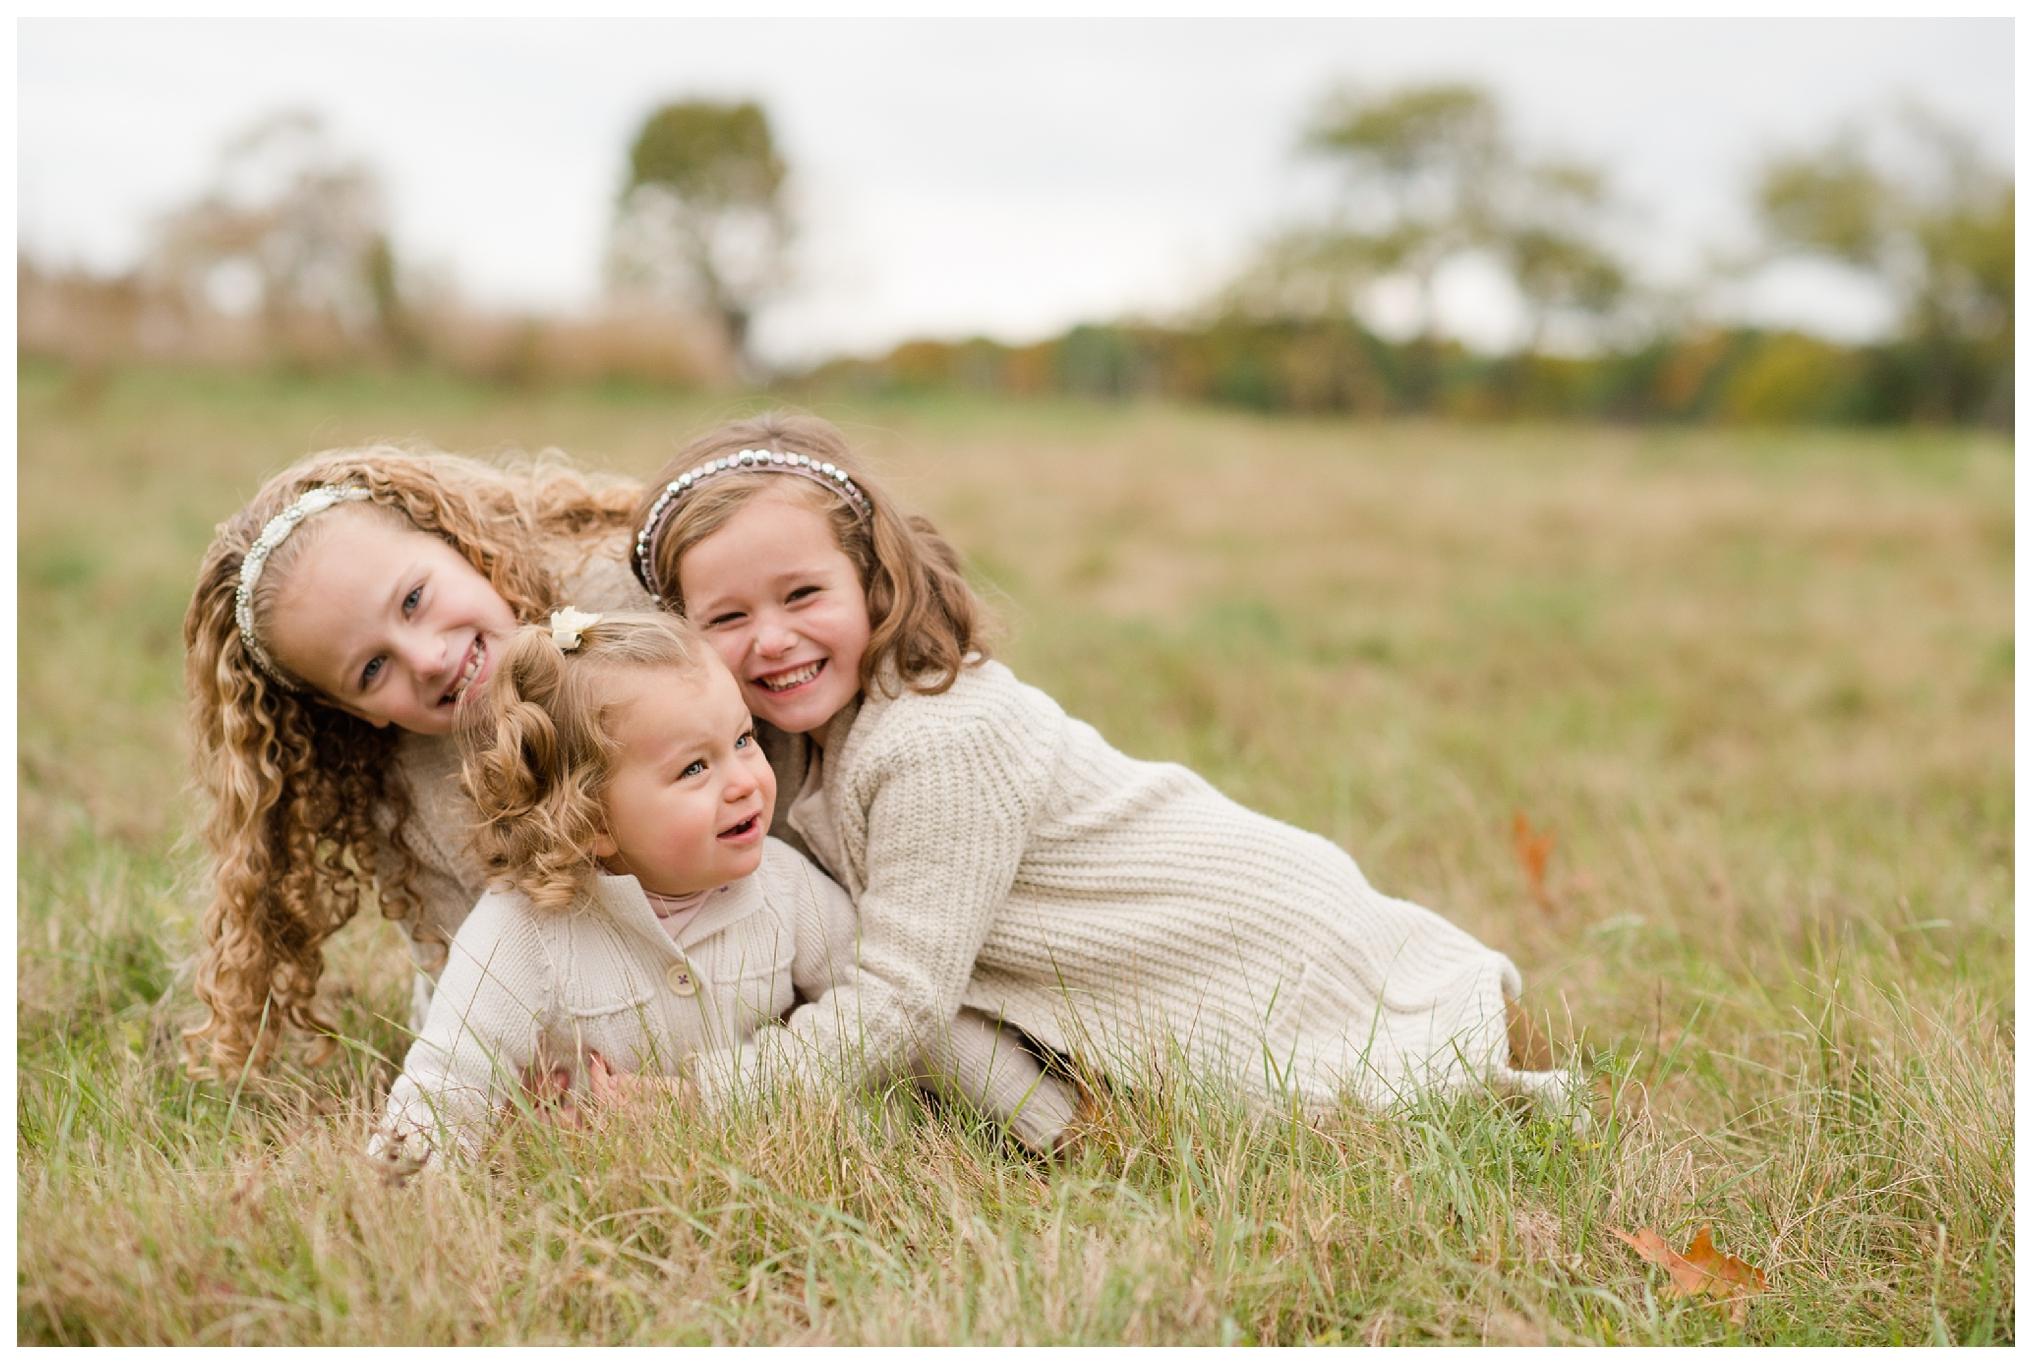 Fall-Family-Photos-Sweet-Light-Portraits07.jpg